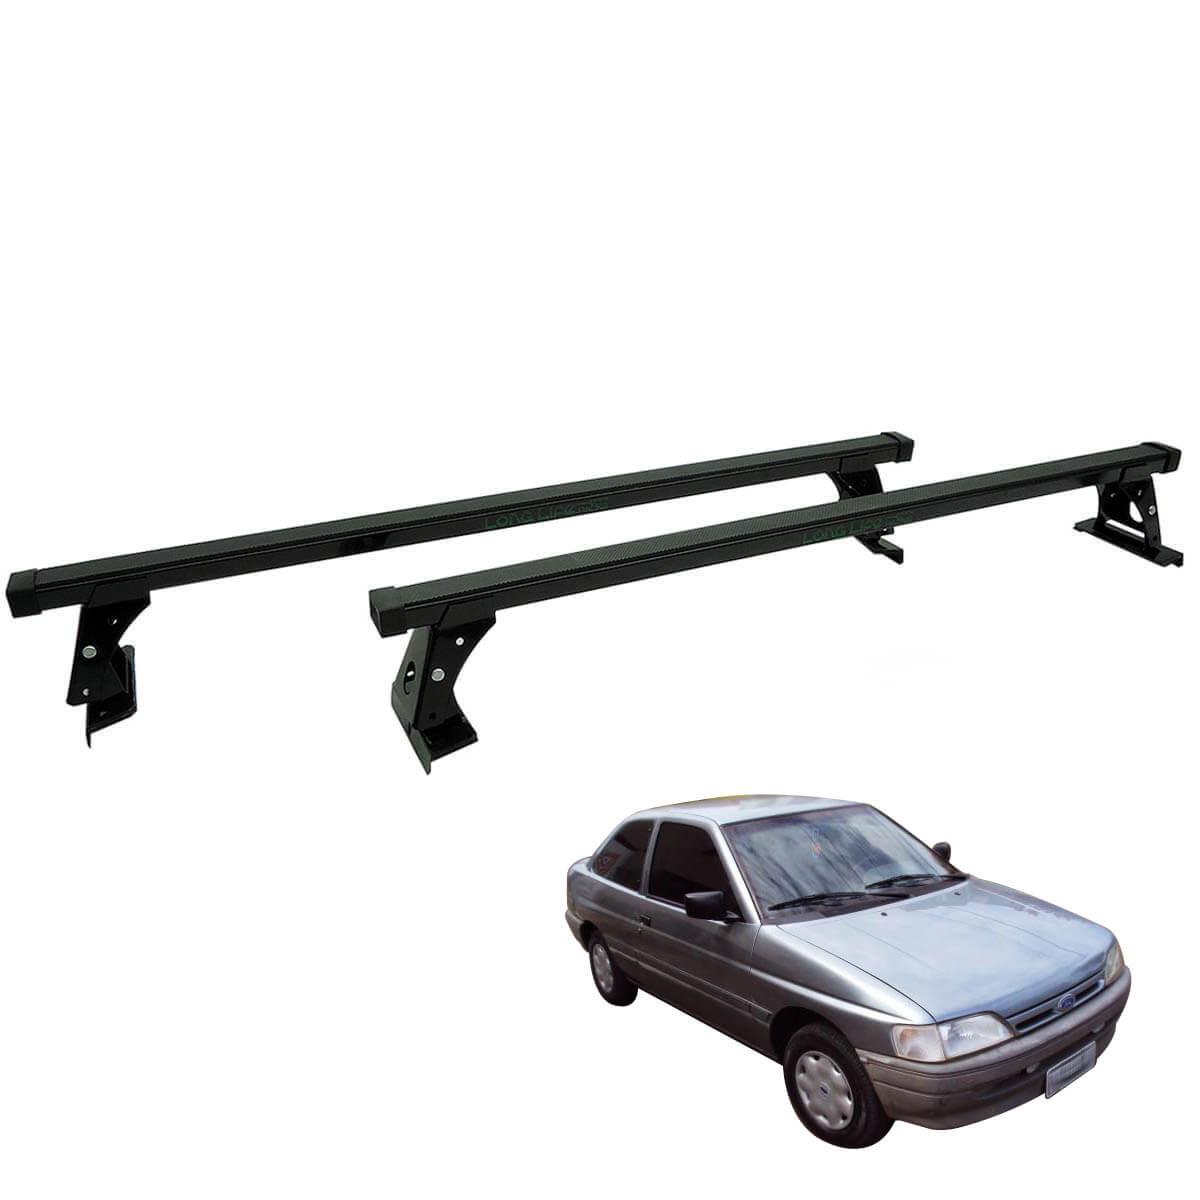 Rack de teto Long Life Aço Escort ou Logus 1993 a 2000 2 portas